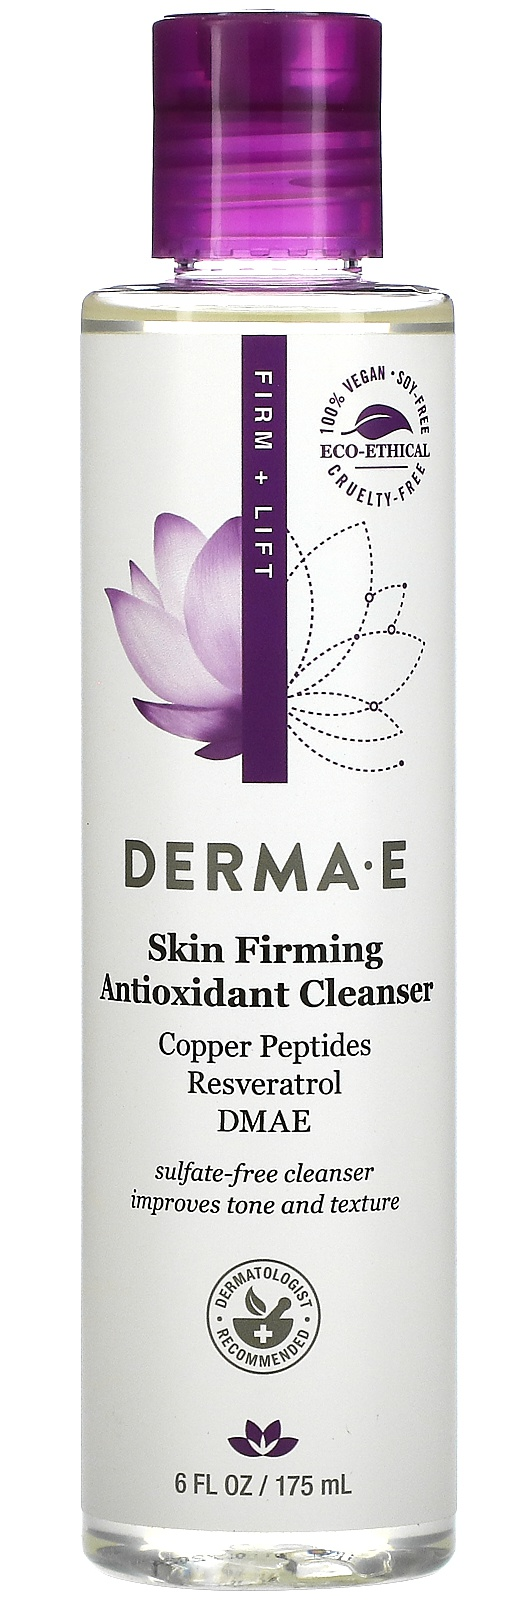 Derma E Skin Firming Antioxidant Cleanser